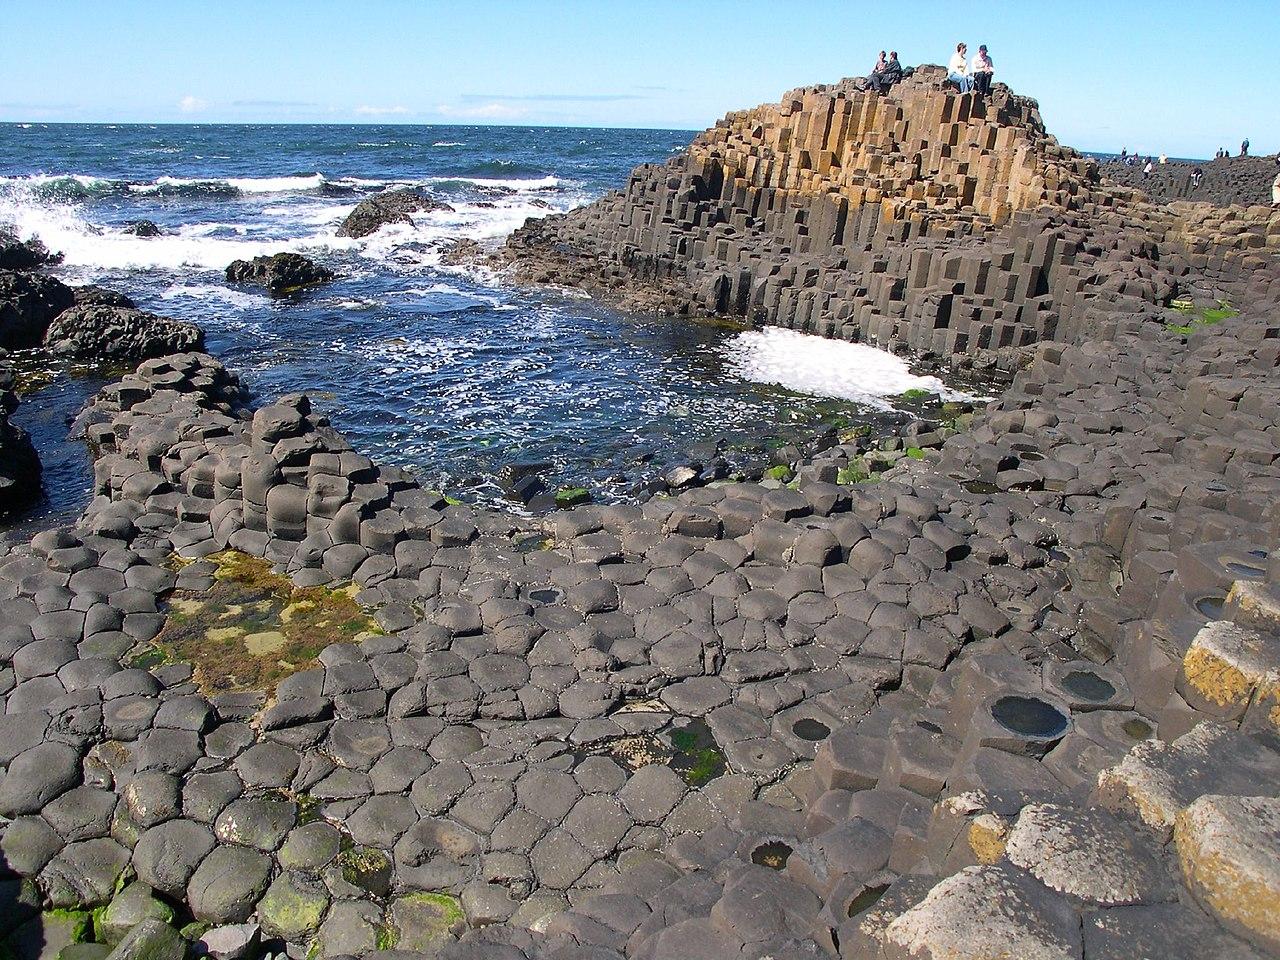 The Giant's Causeway, Ireland (Image)